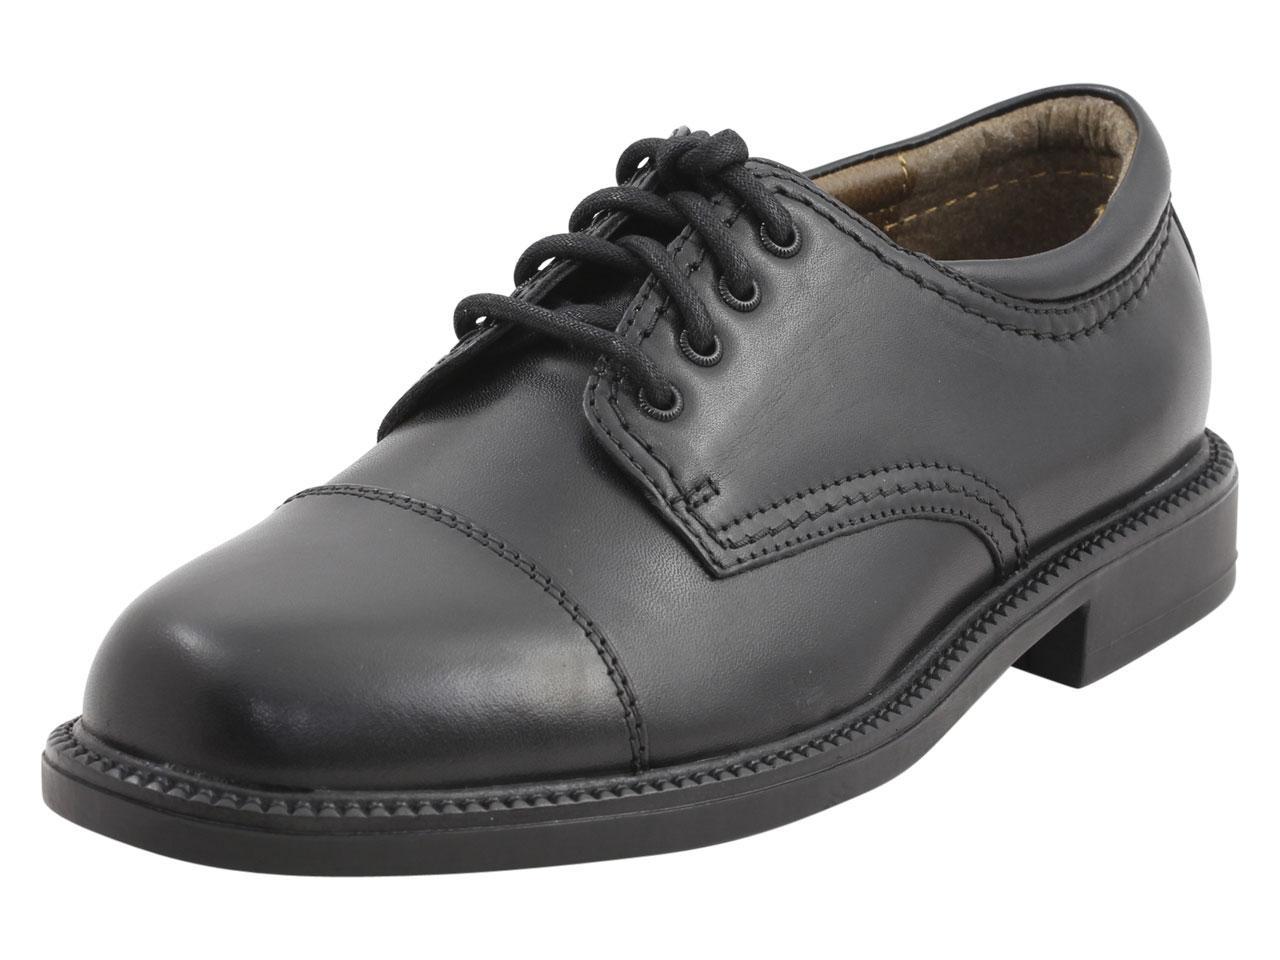 Image of Dockers Men's Gordon Cap Toe Oxfords Shoes - Black - 11.5 E(W) US